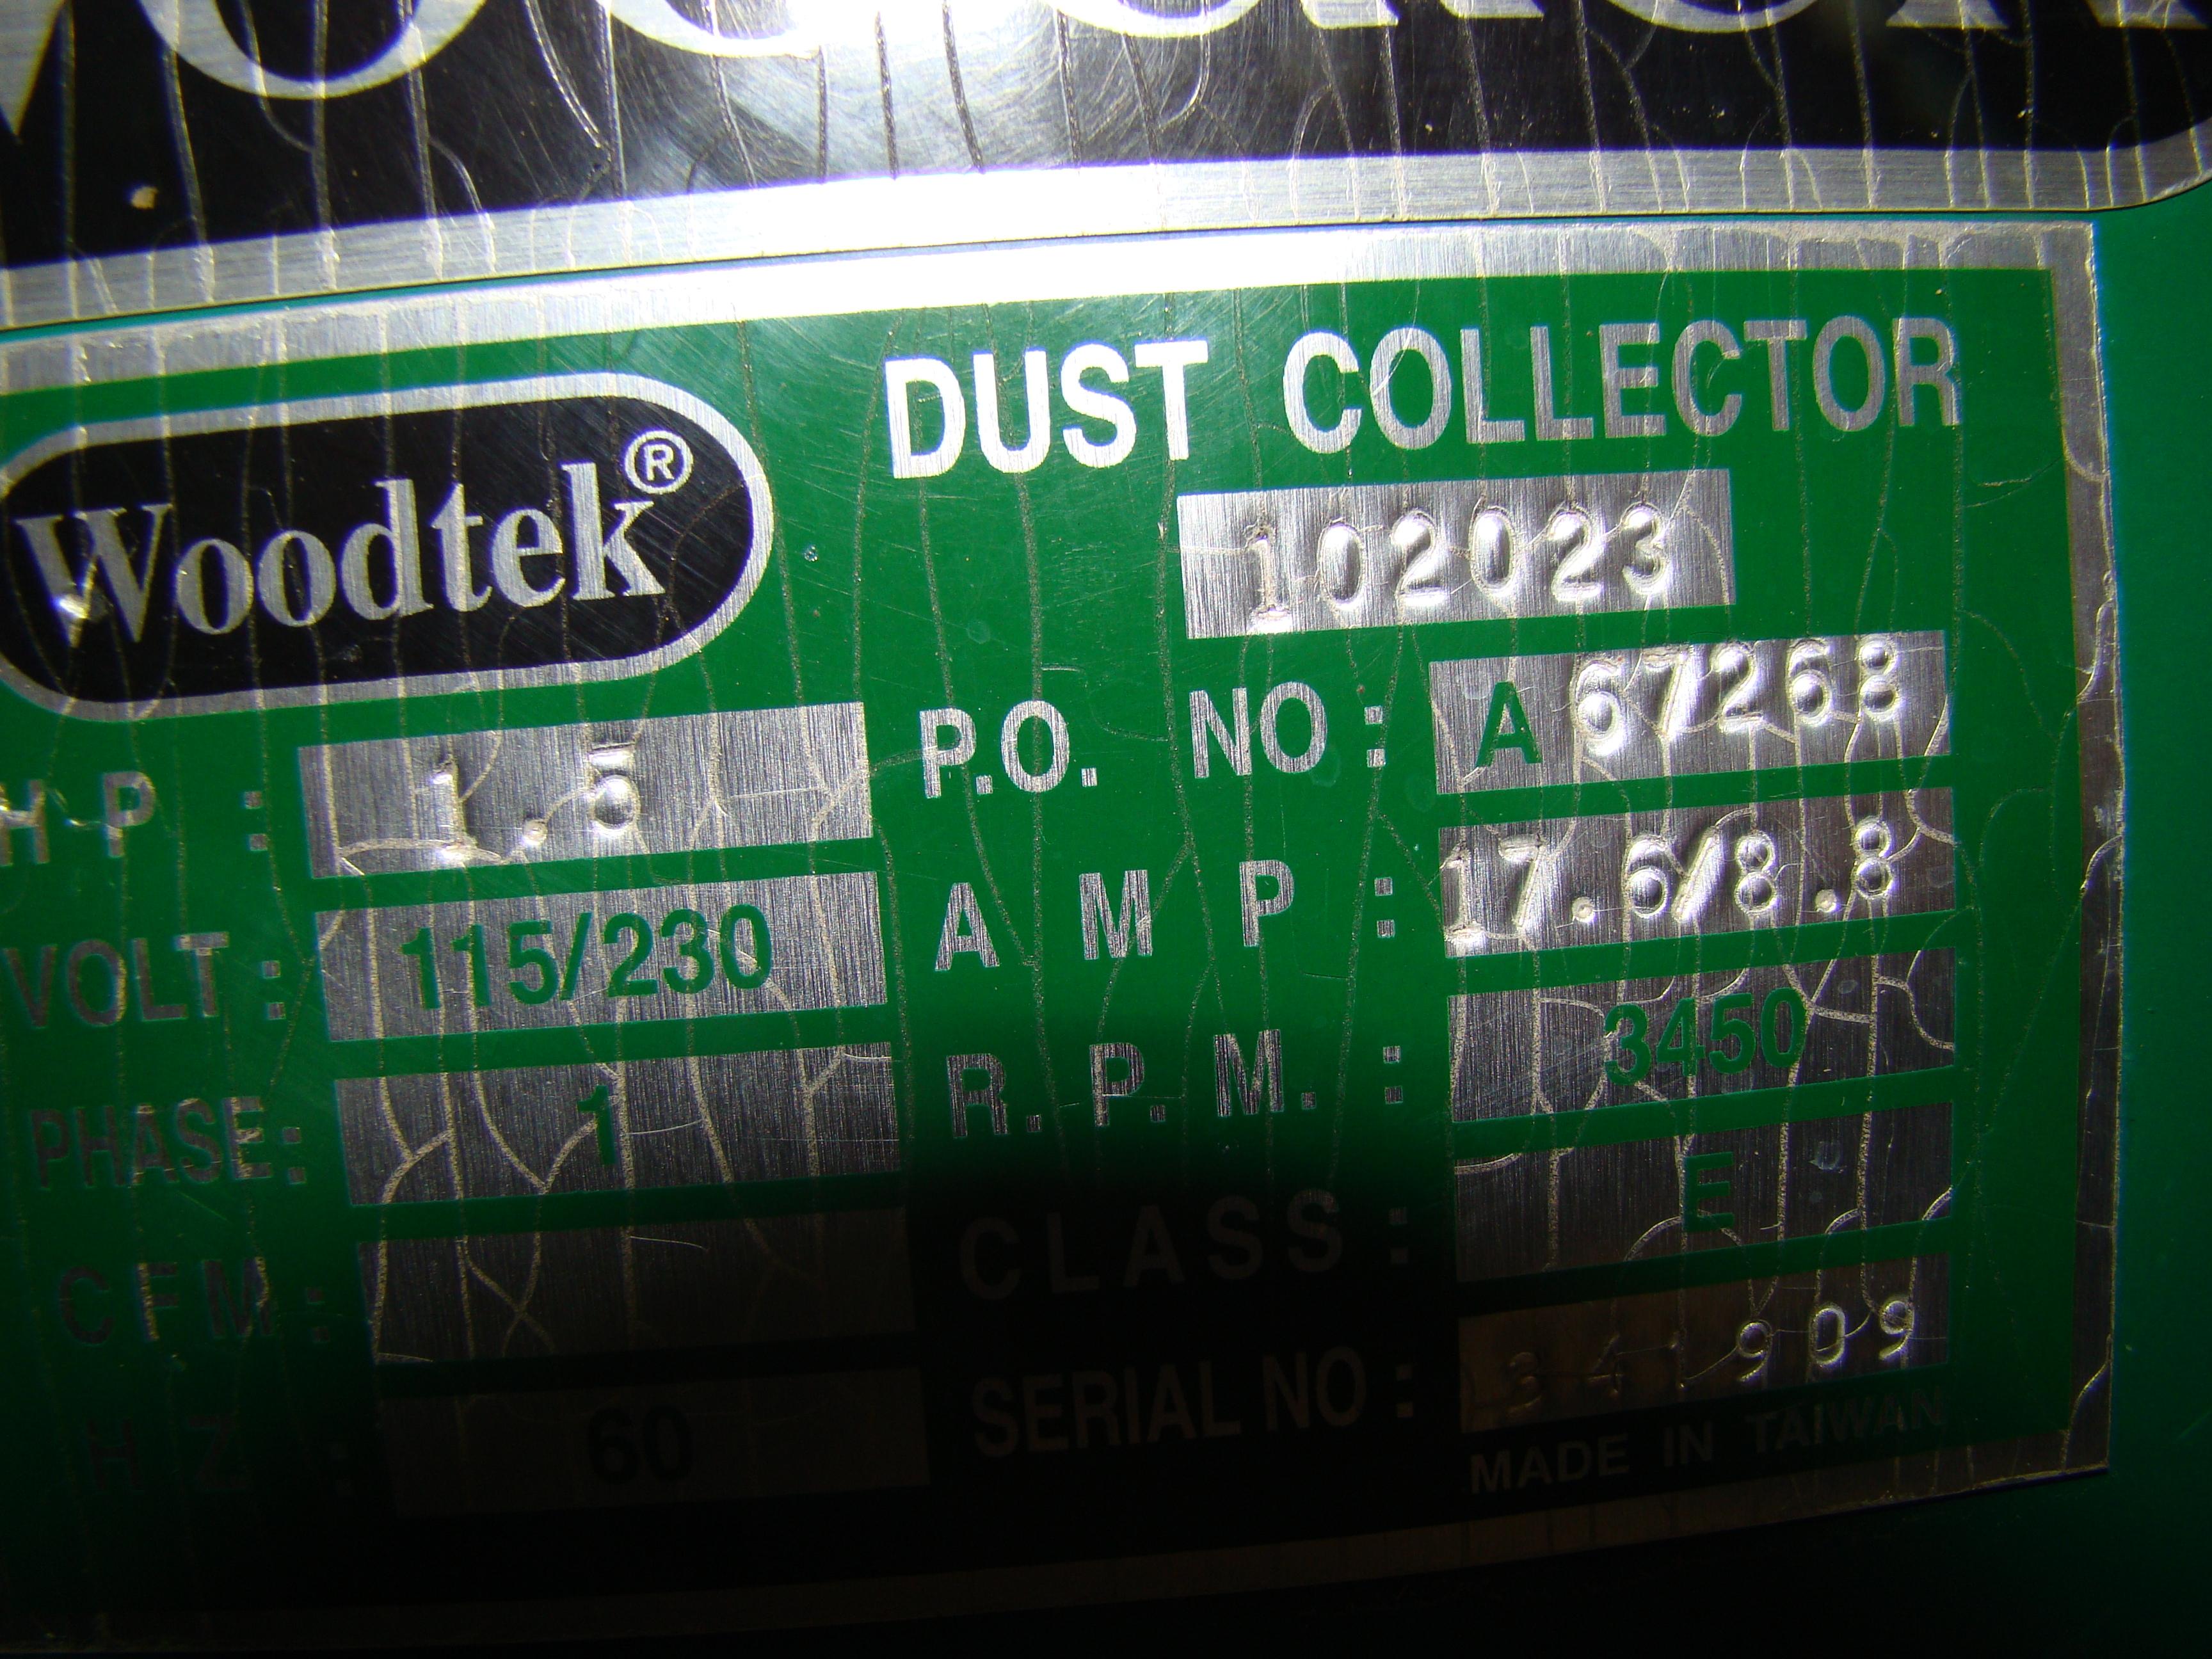 Woodtek Dust Collector 102023 1.5 HP 115/230V 1PH - Image 3 of 6